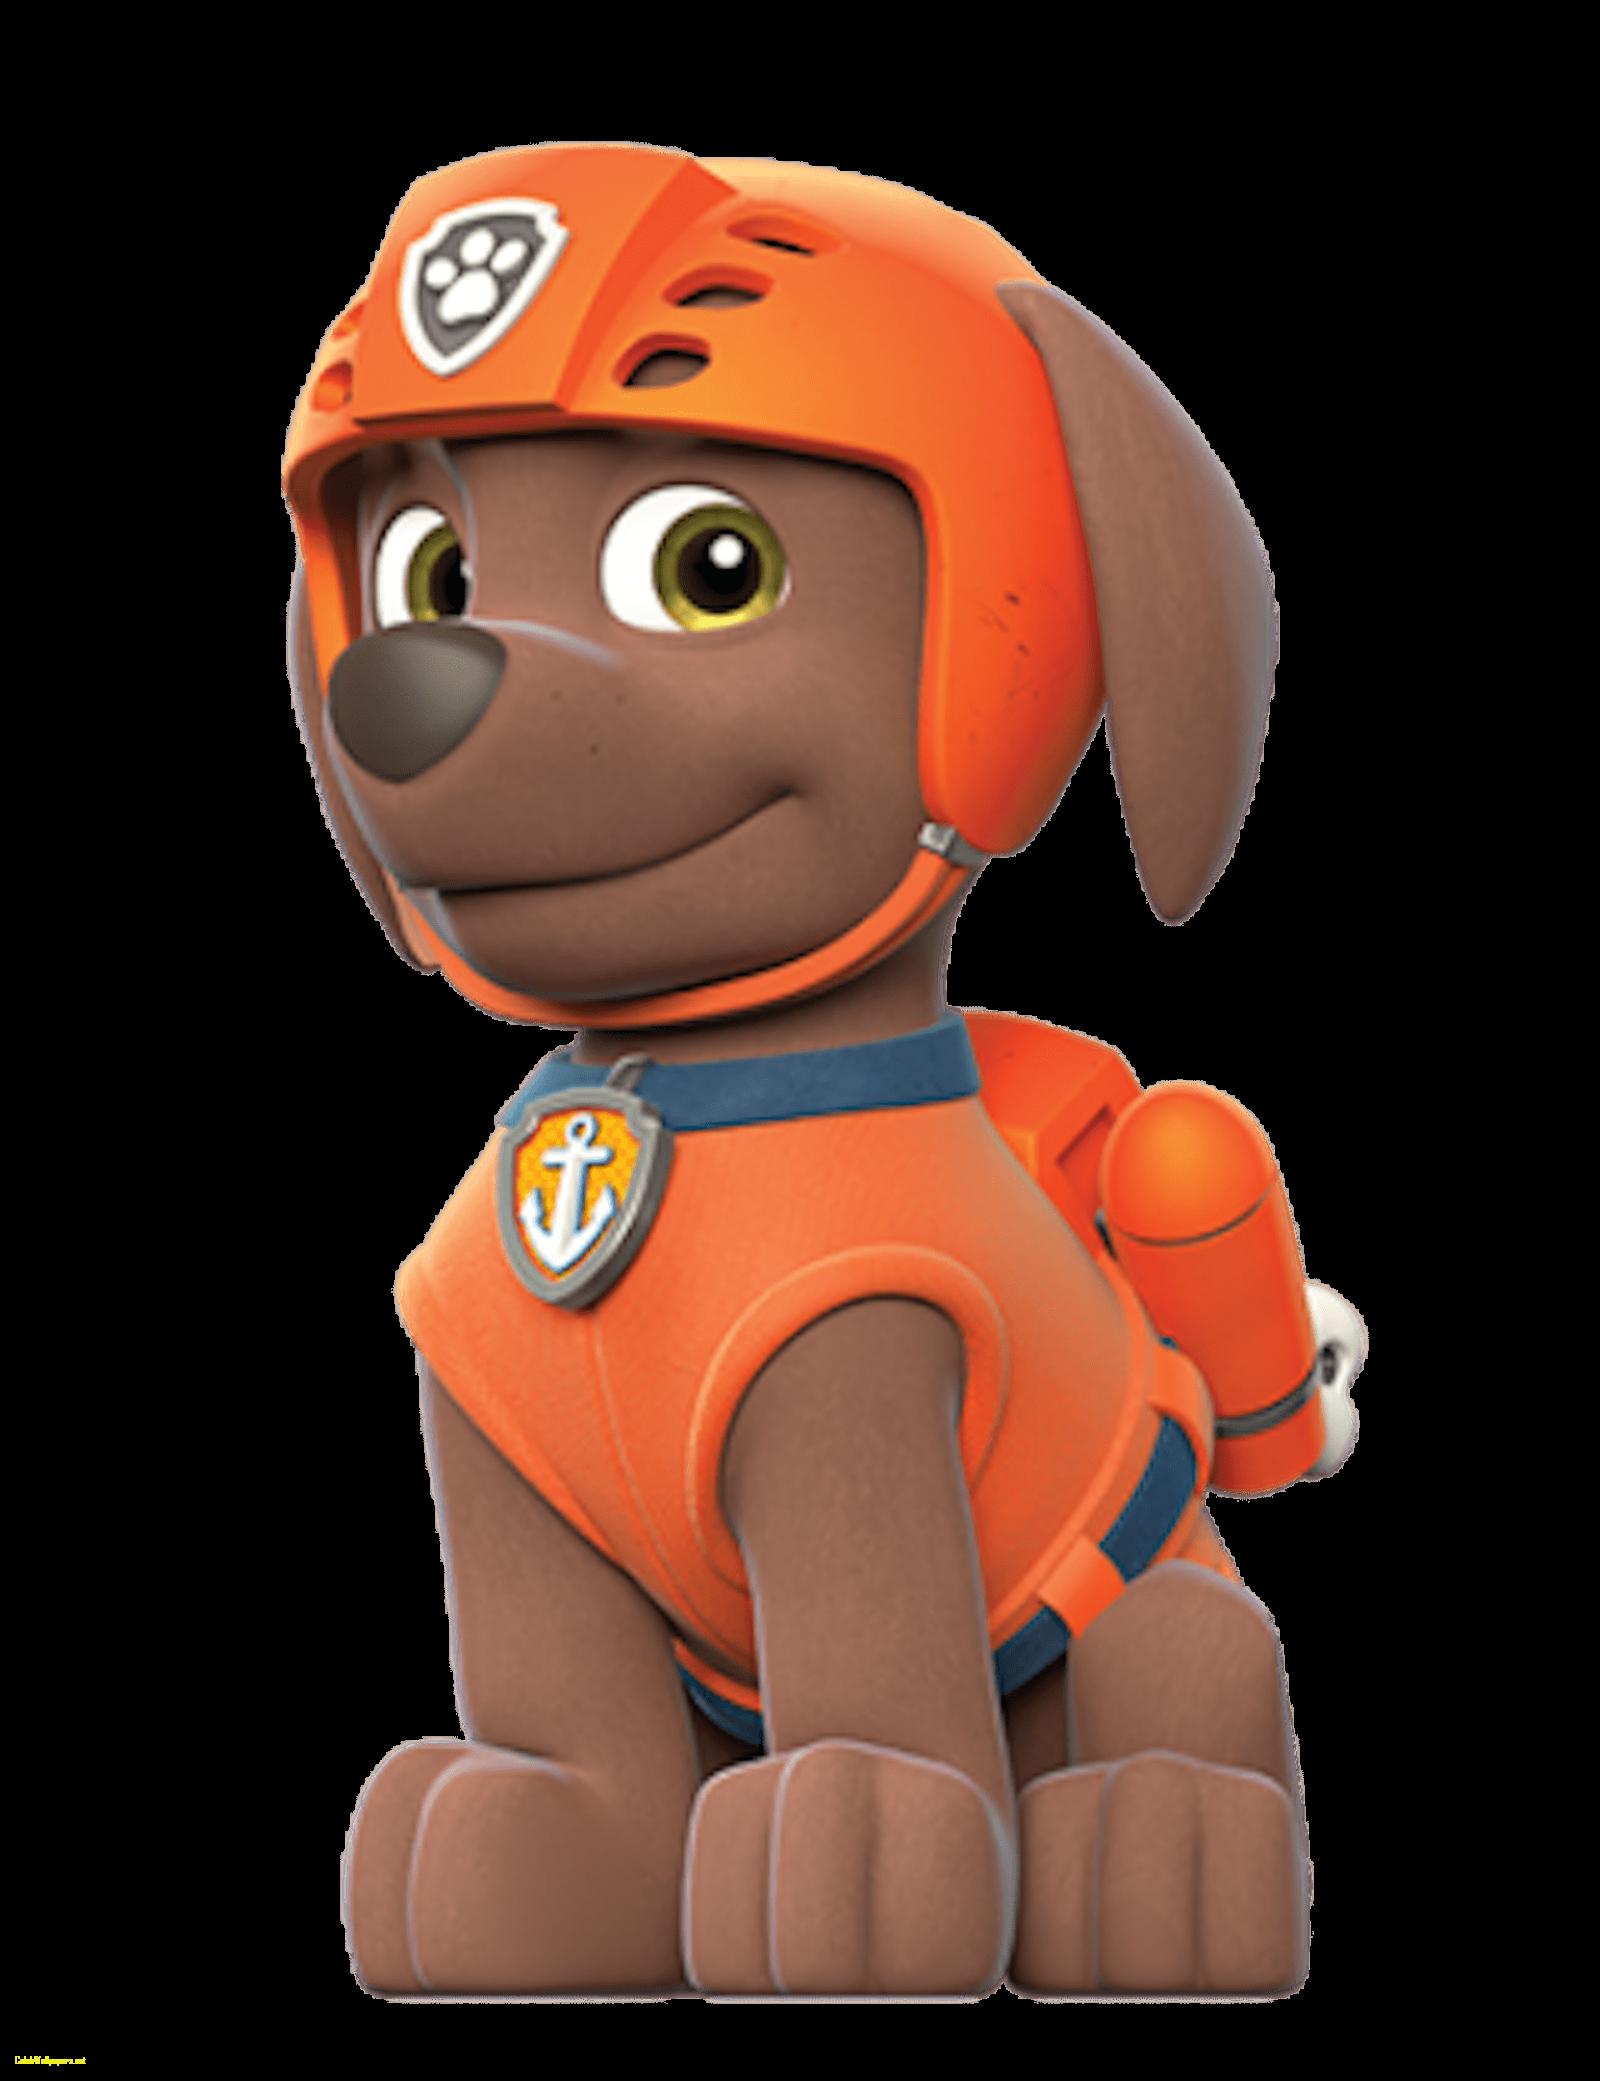 Paw clipart paw patrol. Zuma labrador retriever puppy